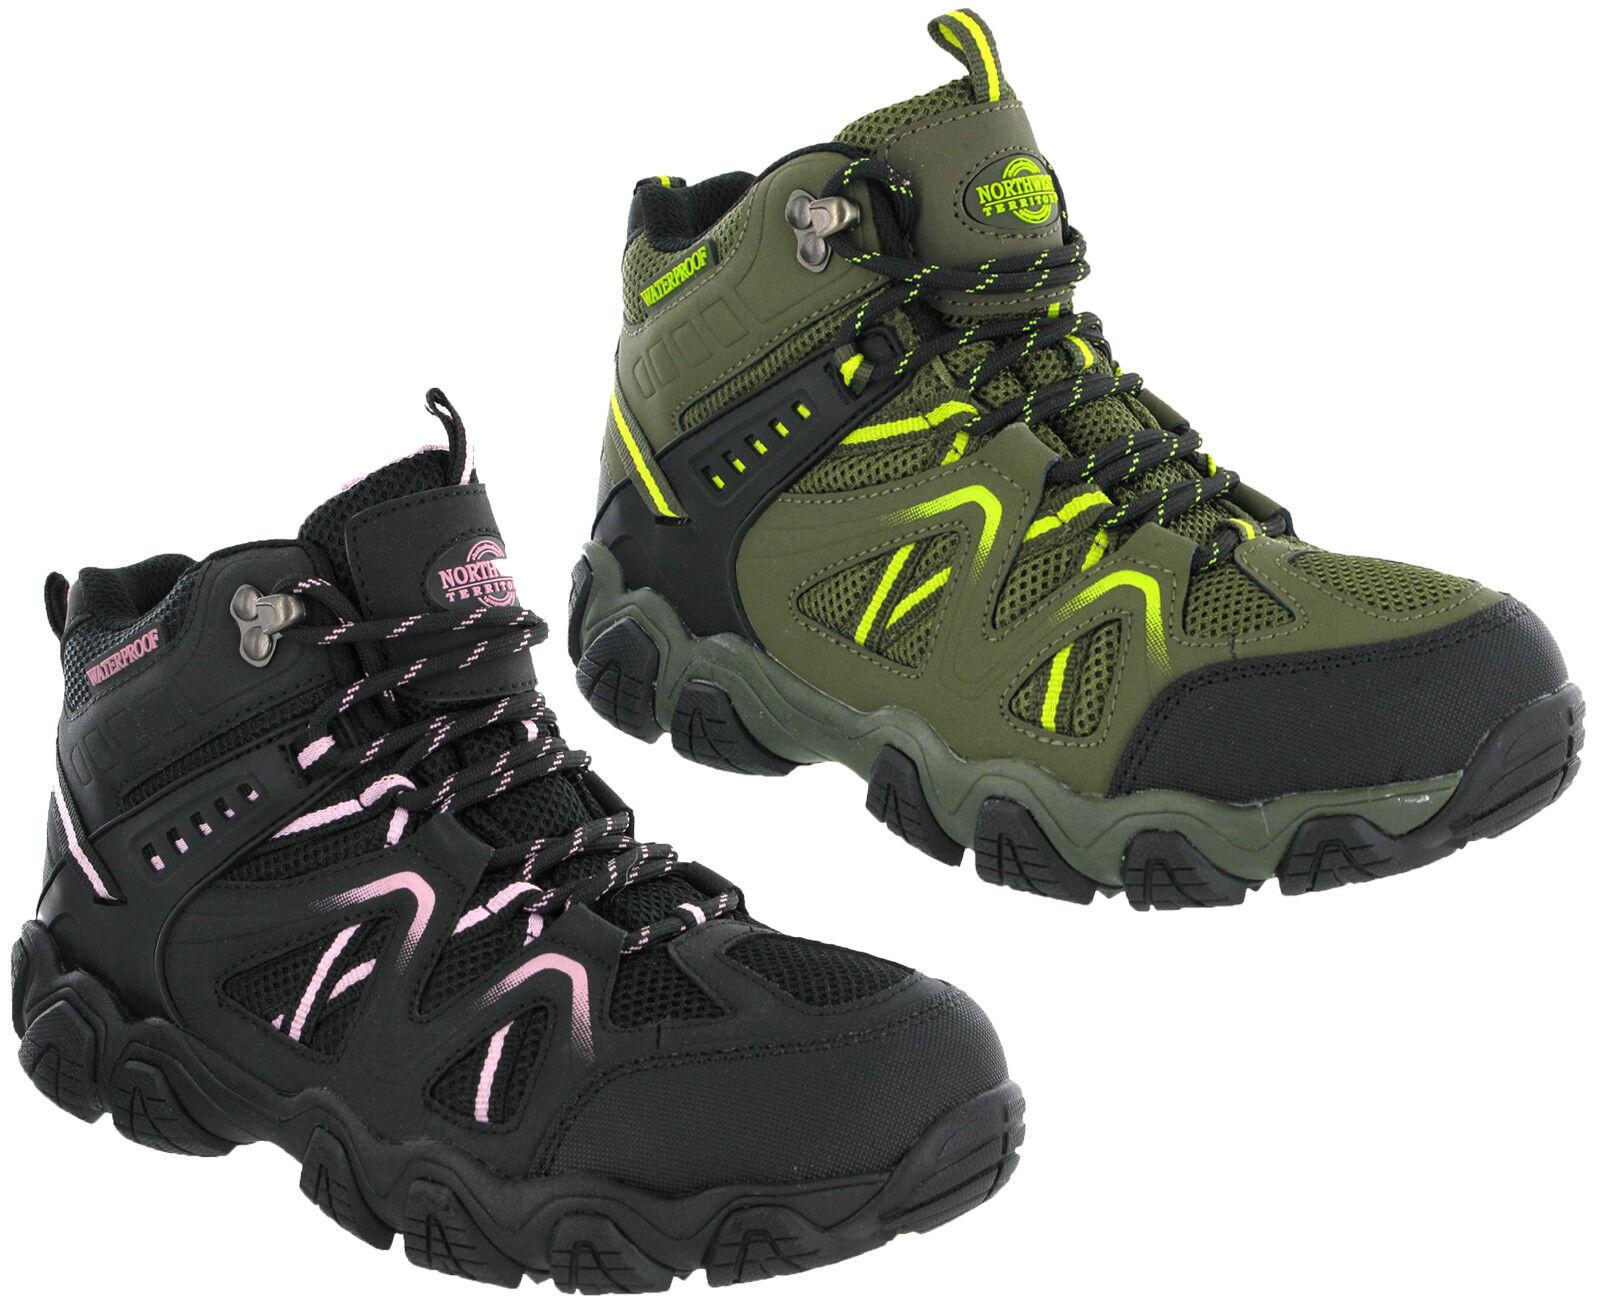 Mujer botas Impermeables Senderismo Northwest tobillo transpirables caminar  vale Reino Unido 4-8  preferente